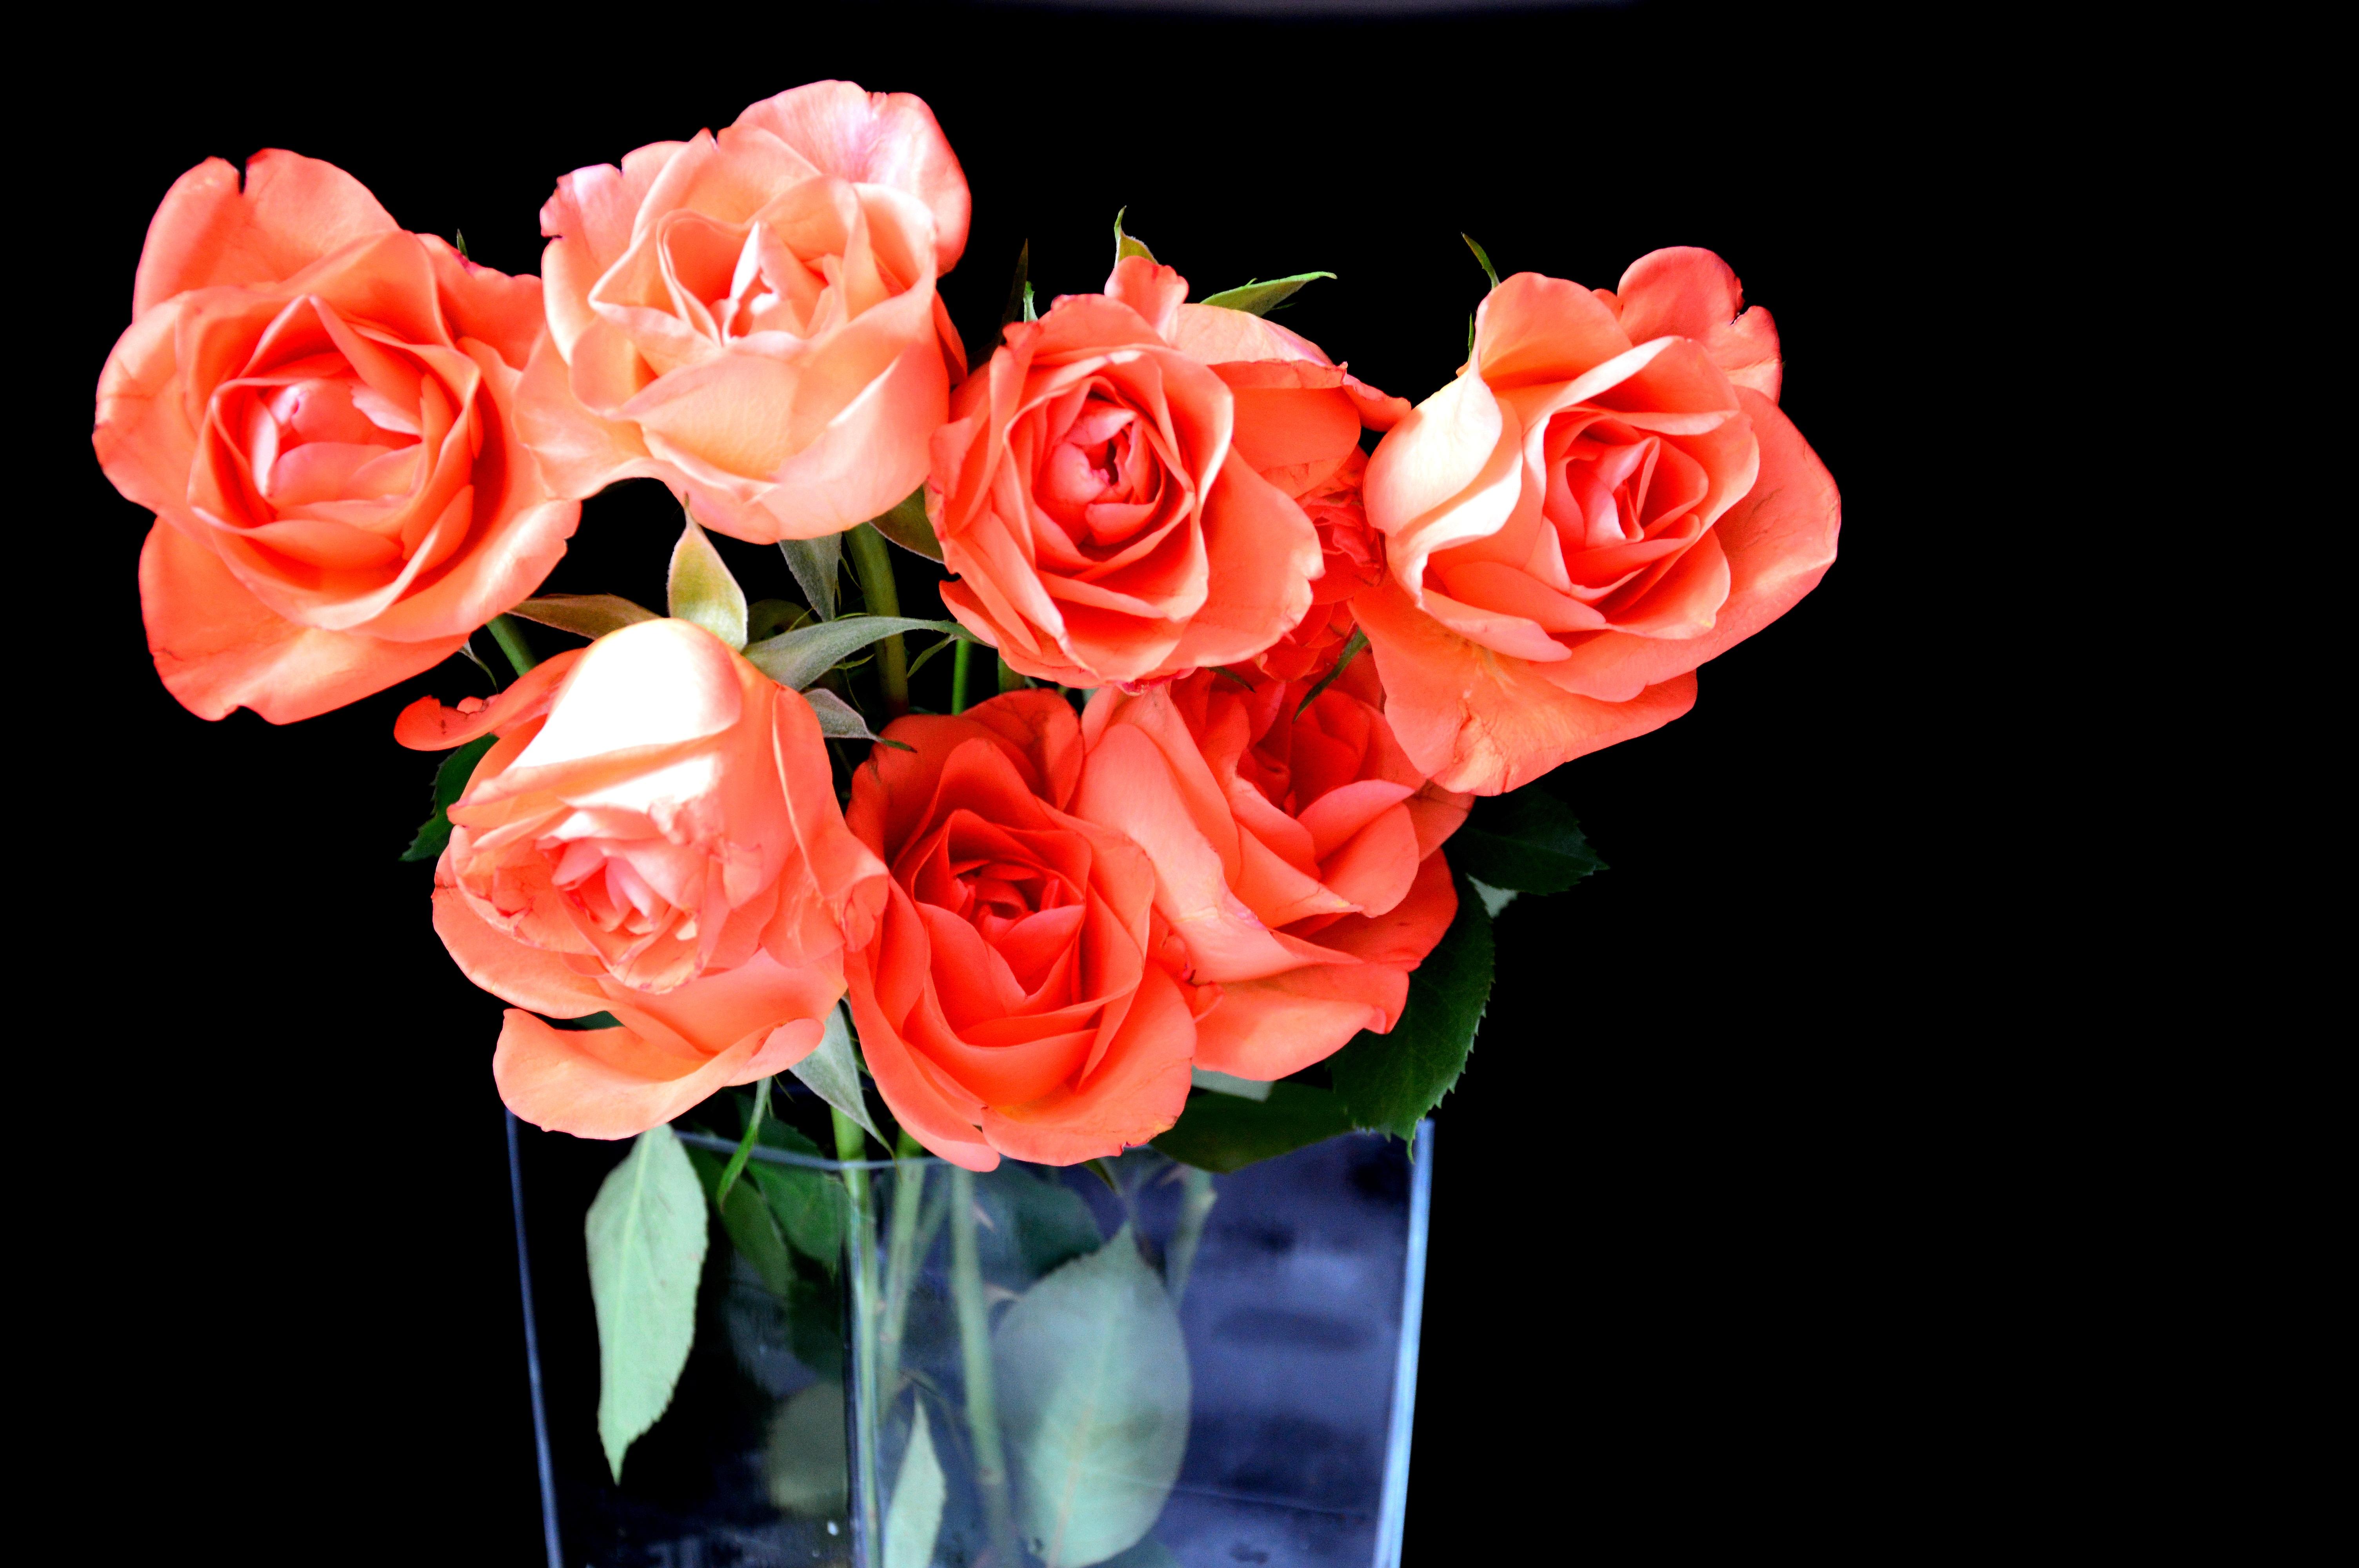 Free images nature petal summer vase decoration red pink free images nature petal summer vase decoration red pink composition bouquet of flowers floristry bunch of flowers floribunda dining table izmirmasajfo